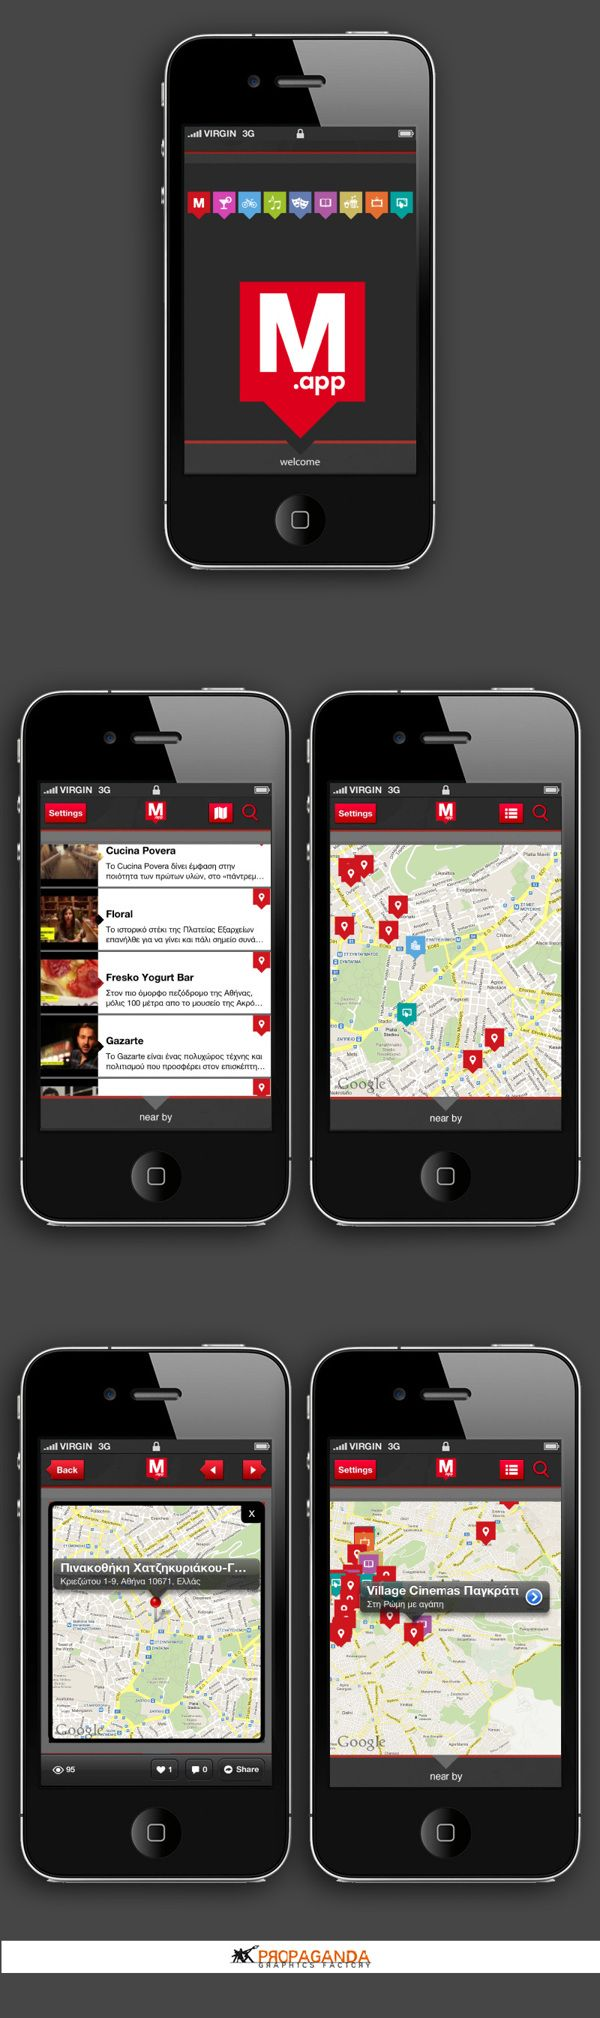 M.APP • UI by Propaganda Graphics Factory , via Behance #propaganda_apps #propaganda_apps #iphone #propagandagf #ui #ux #mobileapp #graphicdesign